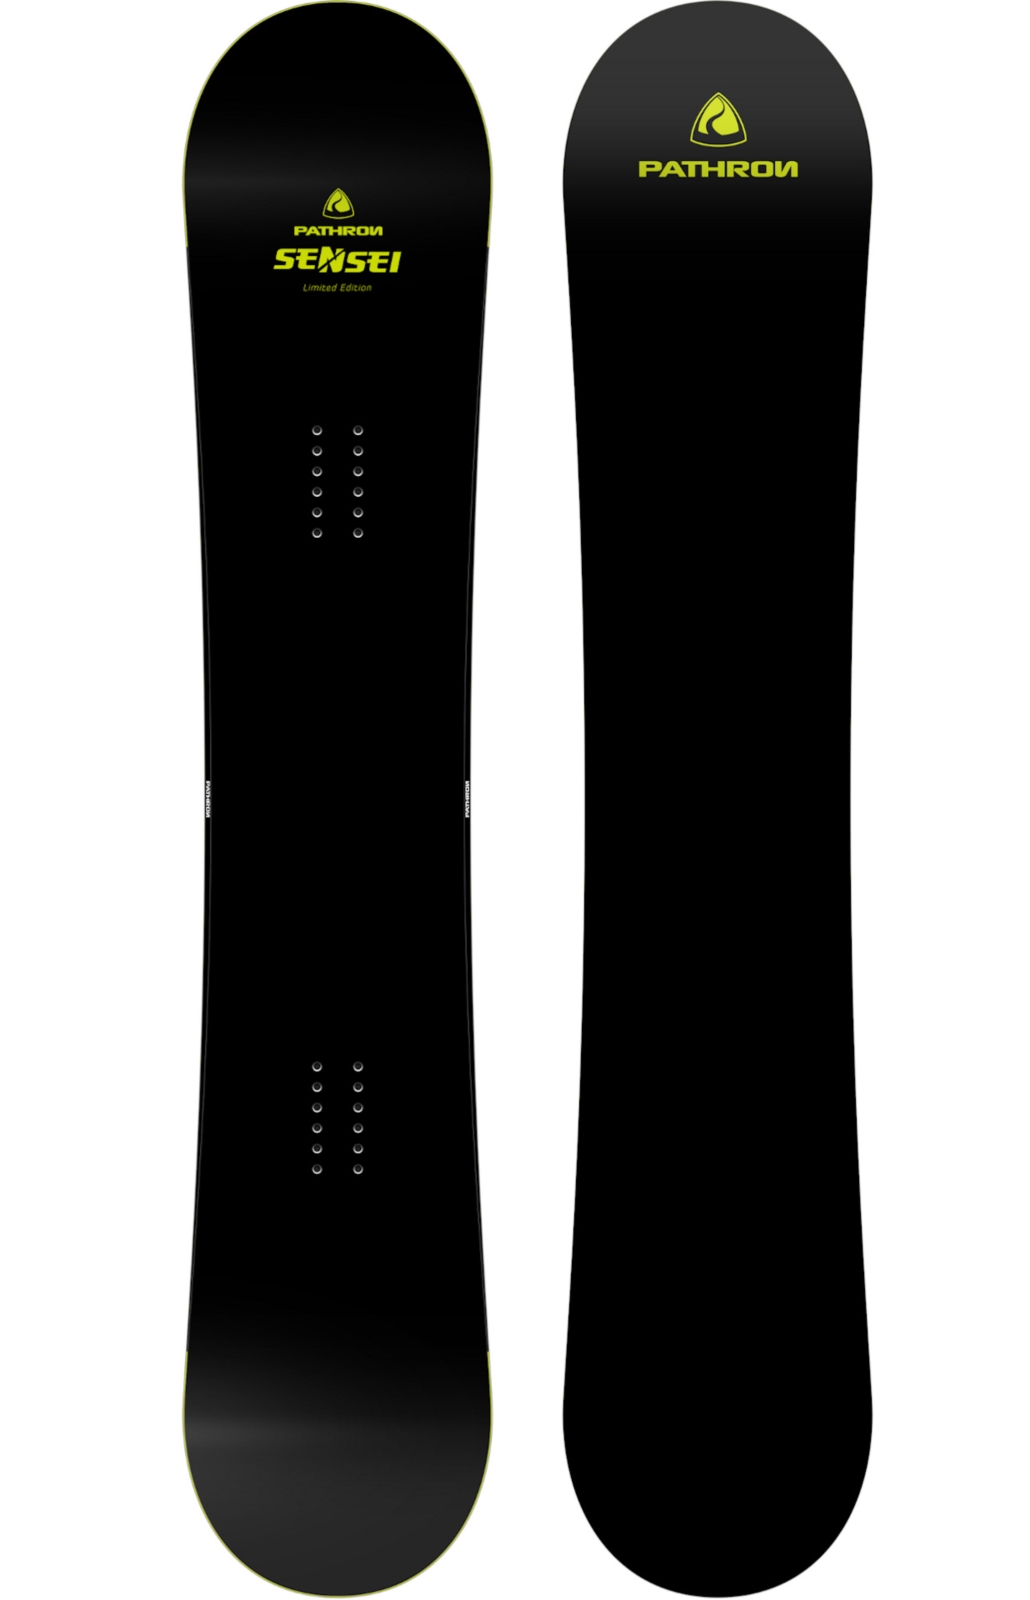 Deska snowboardowa Pathron Sensei Limited 2018/2019 154cm